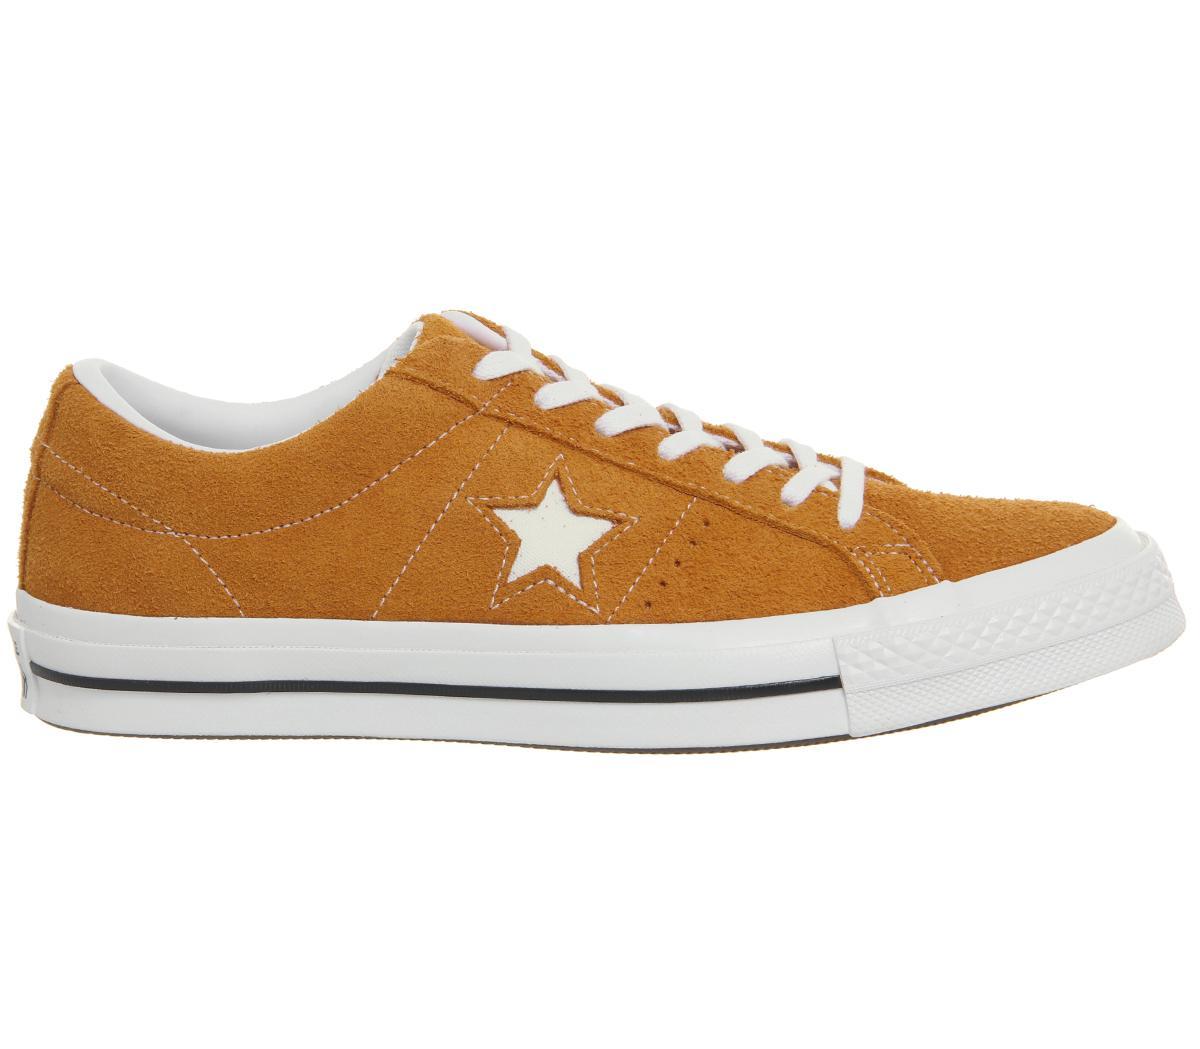 Converse One Star Mandarin White - Hers